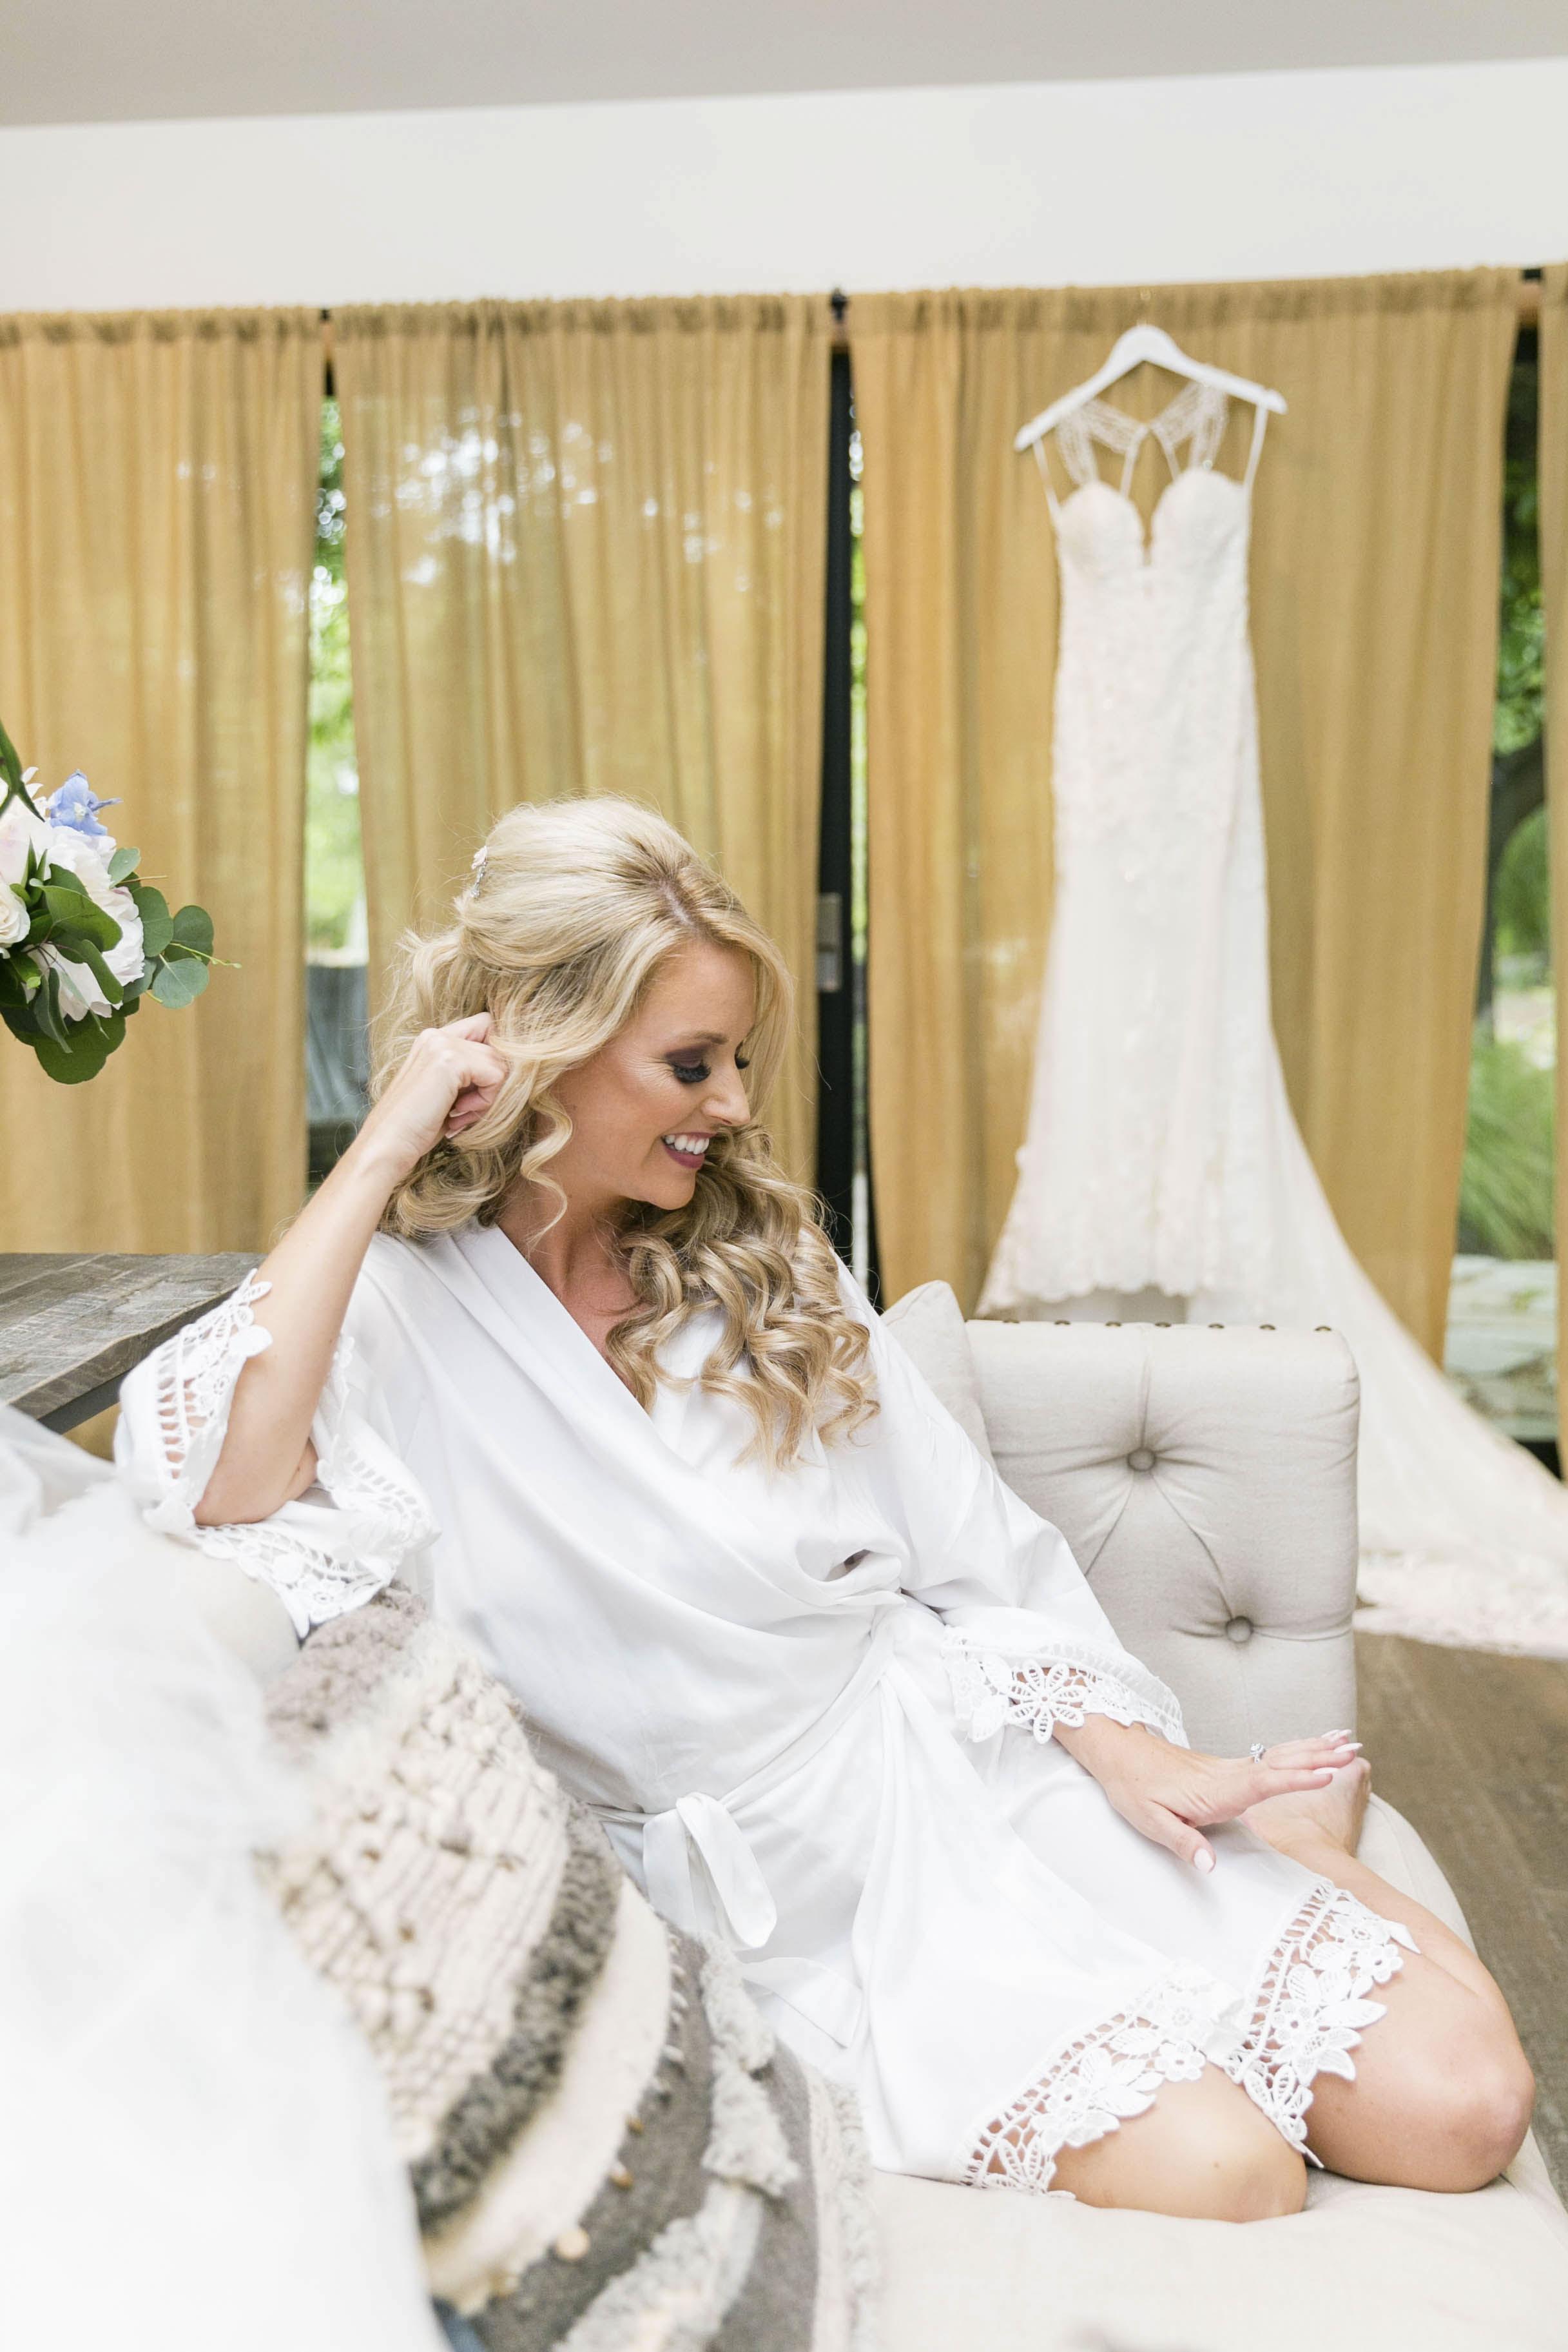 Domenica Beauty _ Hair and Makeup Artist _Wedding _ Temecula, CA Wedding _ Briana and Samuel _ 08.JPG